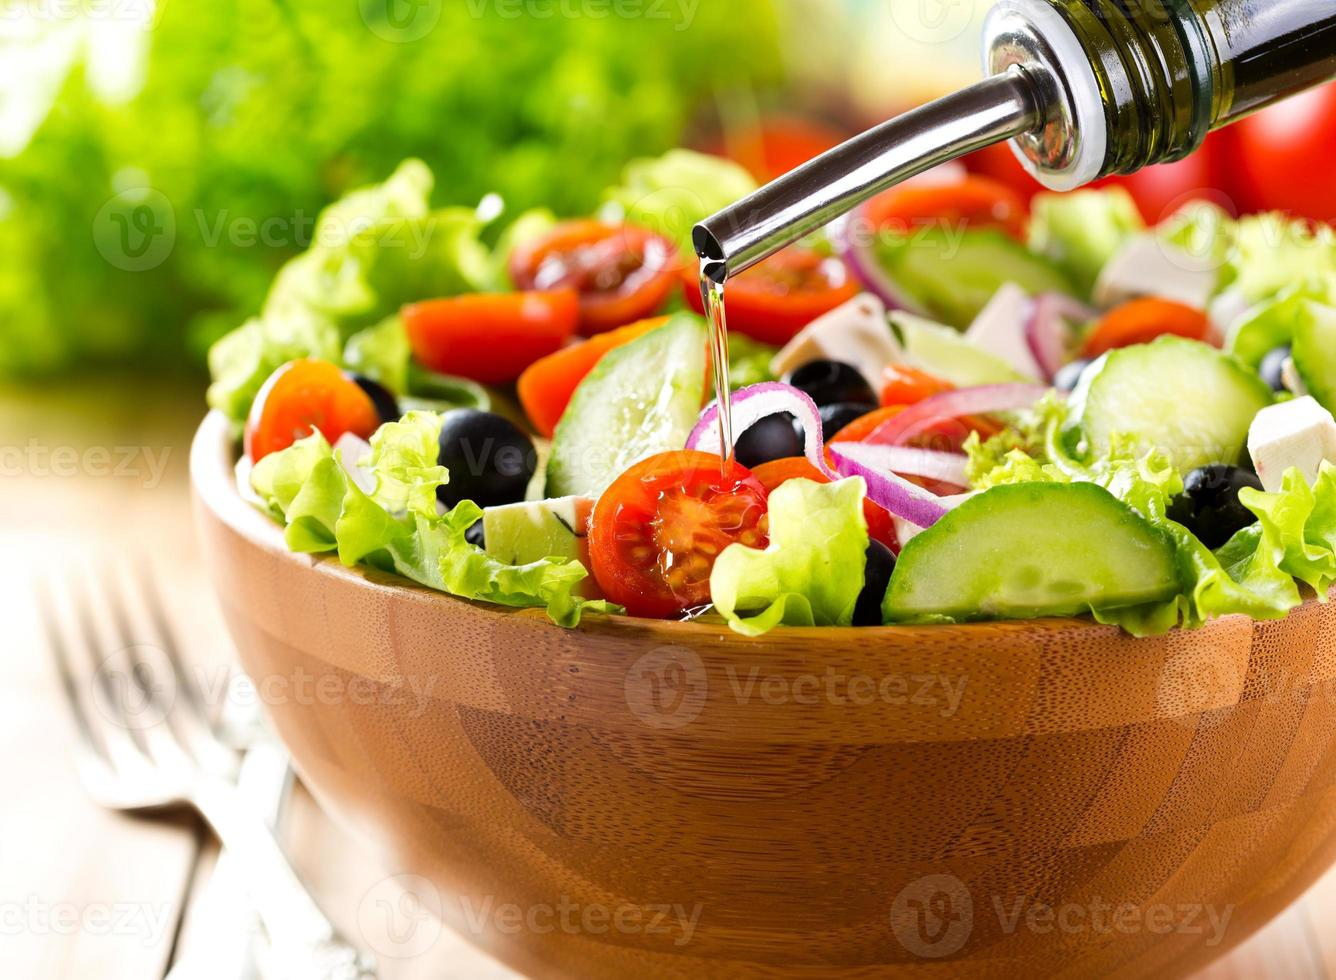 l'huile dans un bol de salade de légumes photo